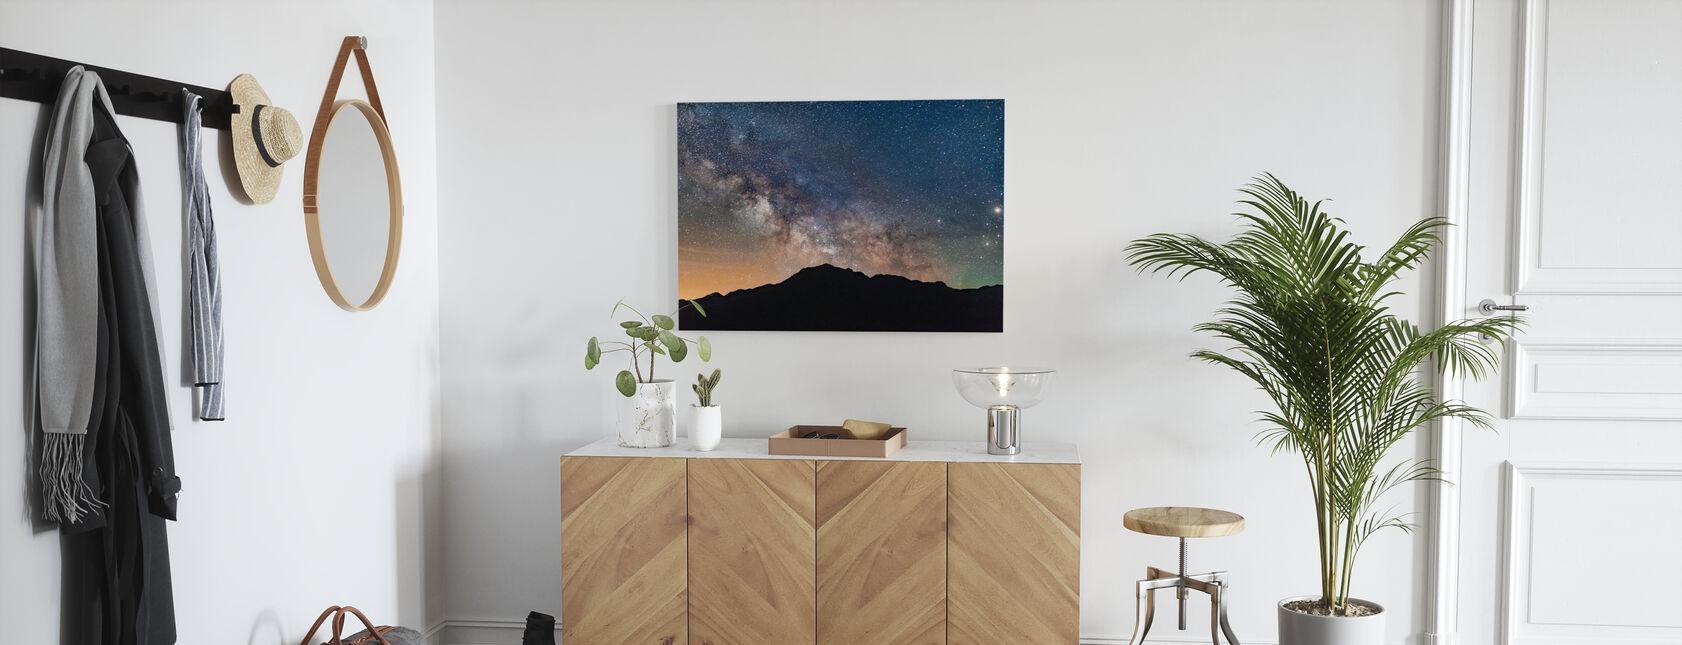 Uitzicht op de Melkweg - Canvas print - Gang